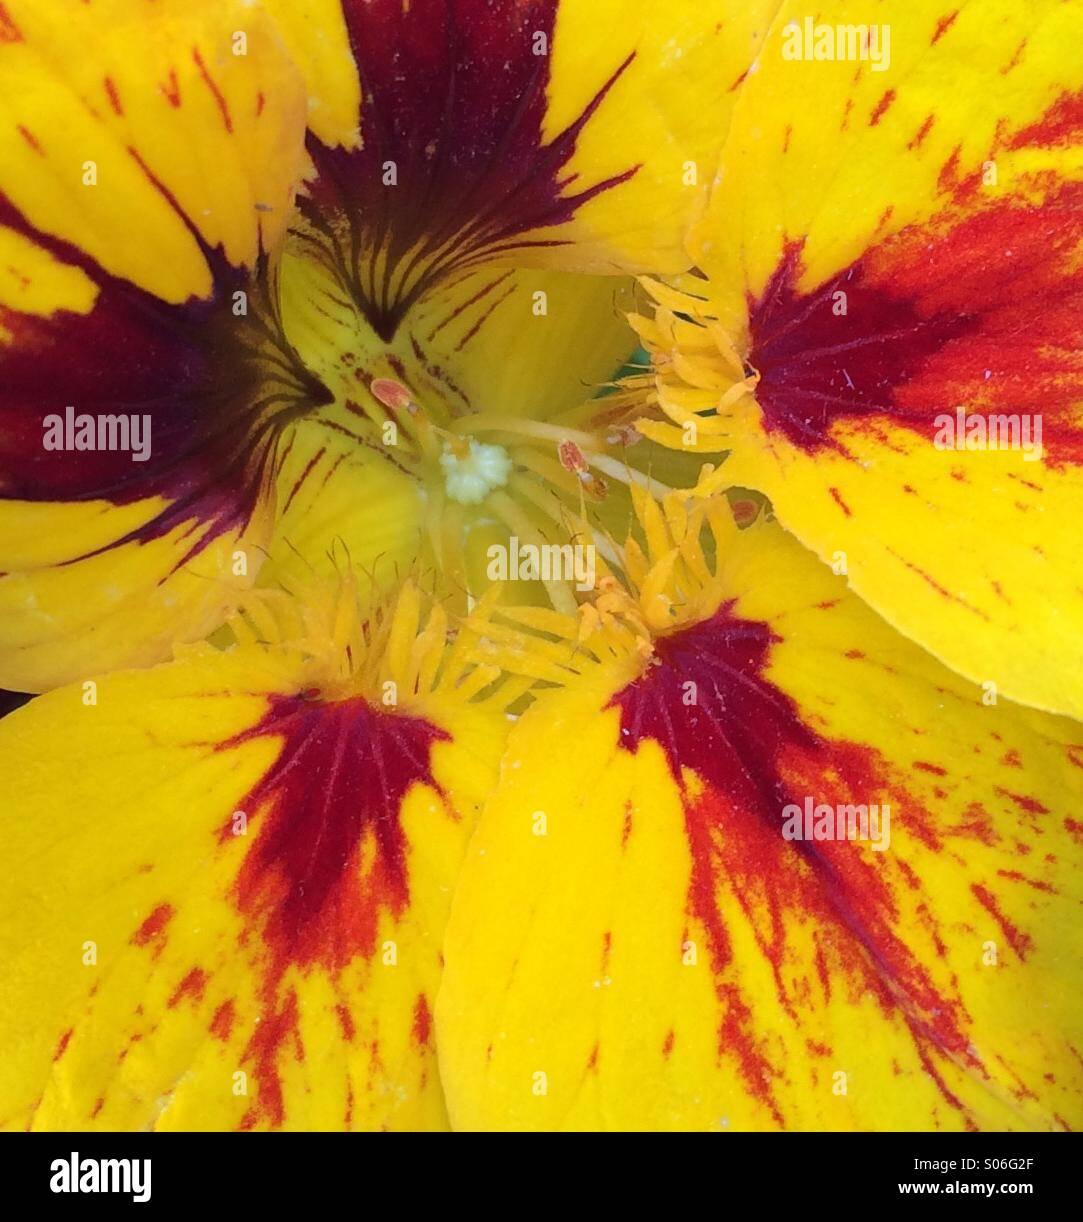 Couleur jaune et rouge d'un splash Nasturtium Photo Stock